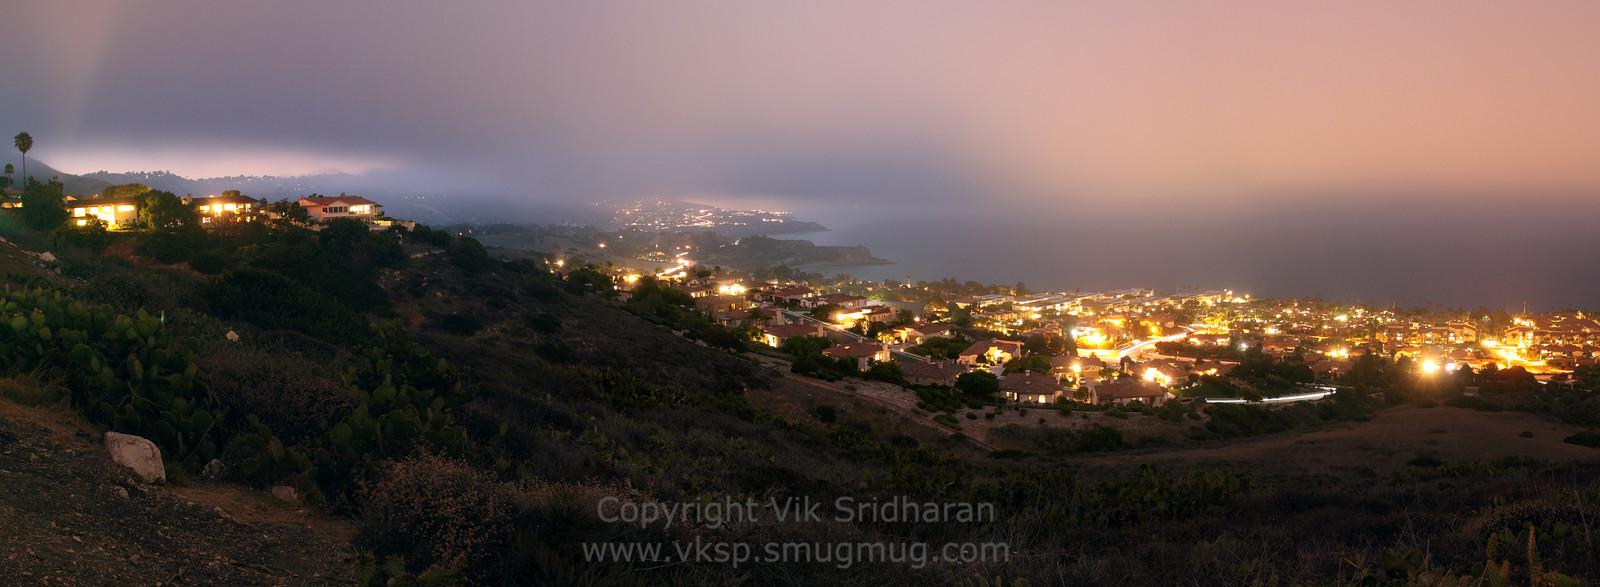 http://www.vksphoto.com/Landscapes/California/Panoramas/i-nRsbWjv/0/X3/COMPOSITE1%208-12-13-X3.jpg